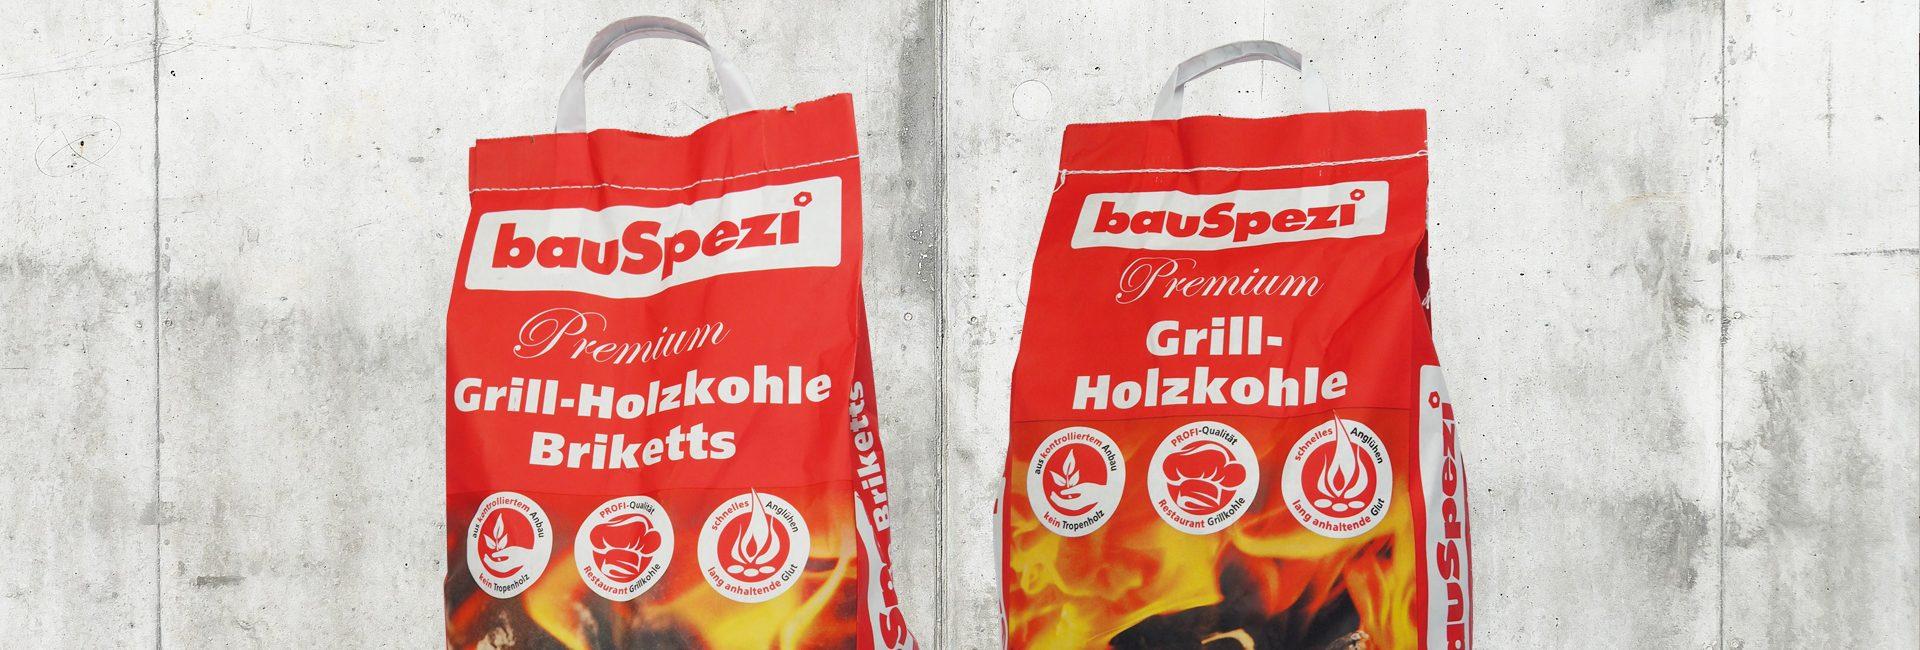 bauSpezi Eigenmarken Holzkohle